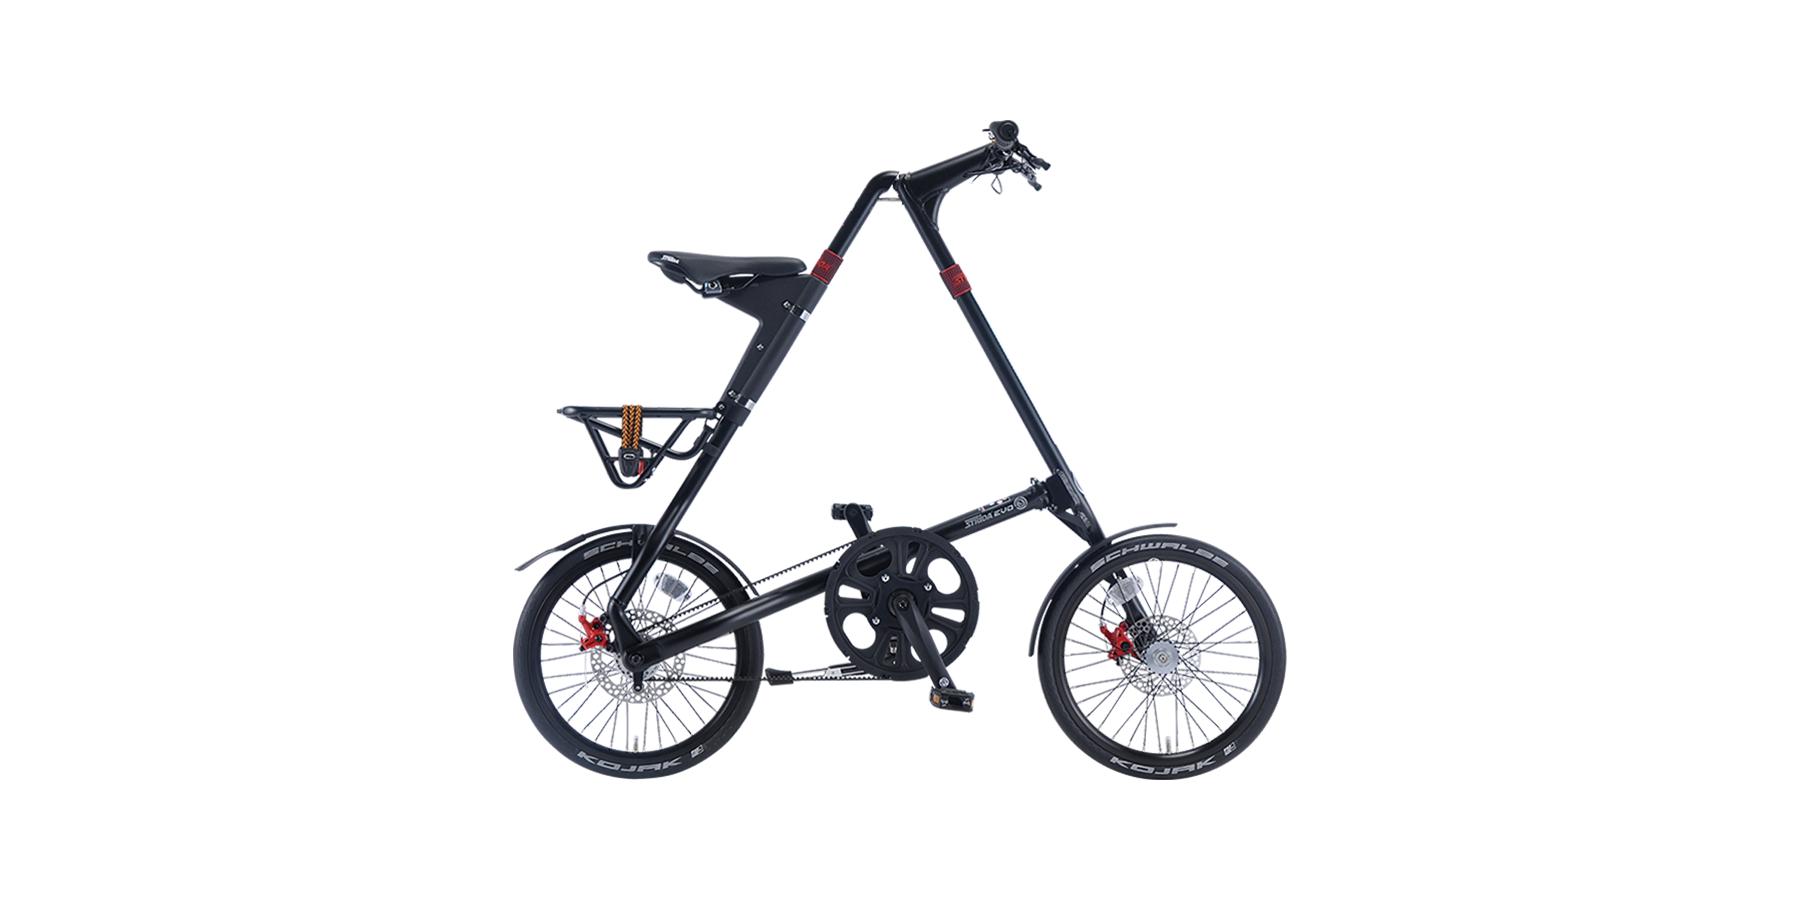 http://www.gsglobal.co.jp/bike/STRIDA/img/photo/pc/1-5_1.png